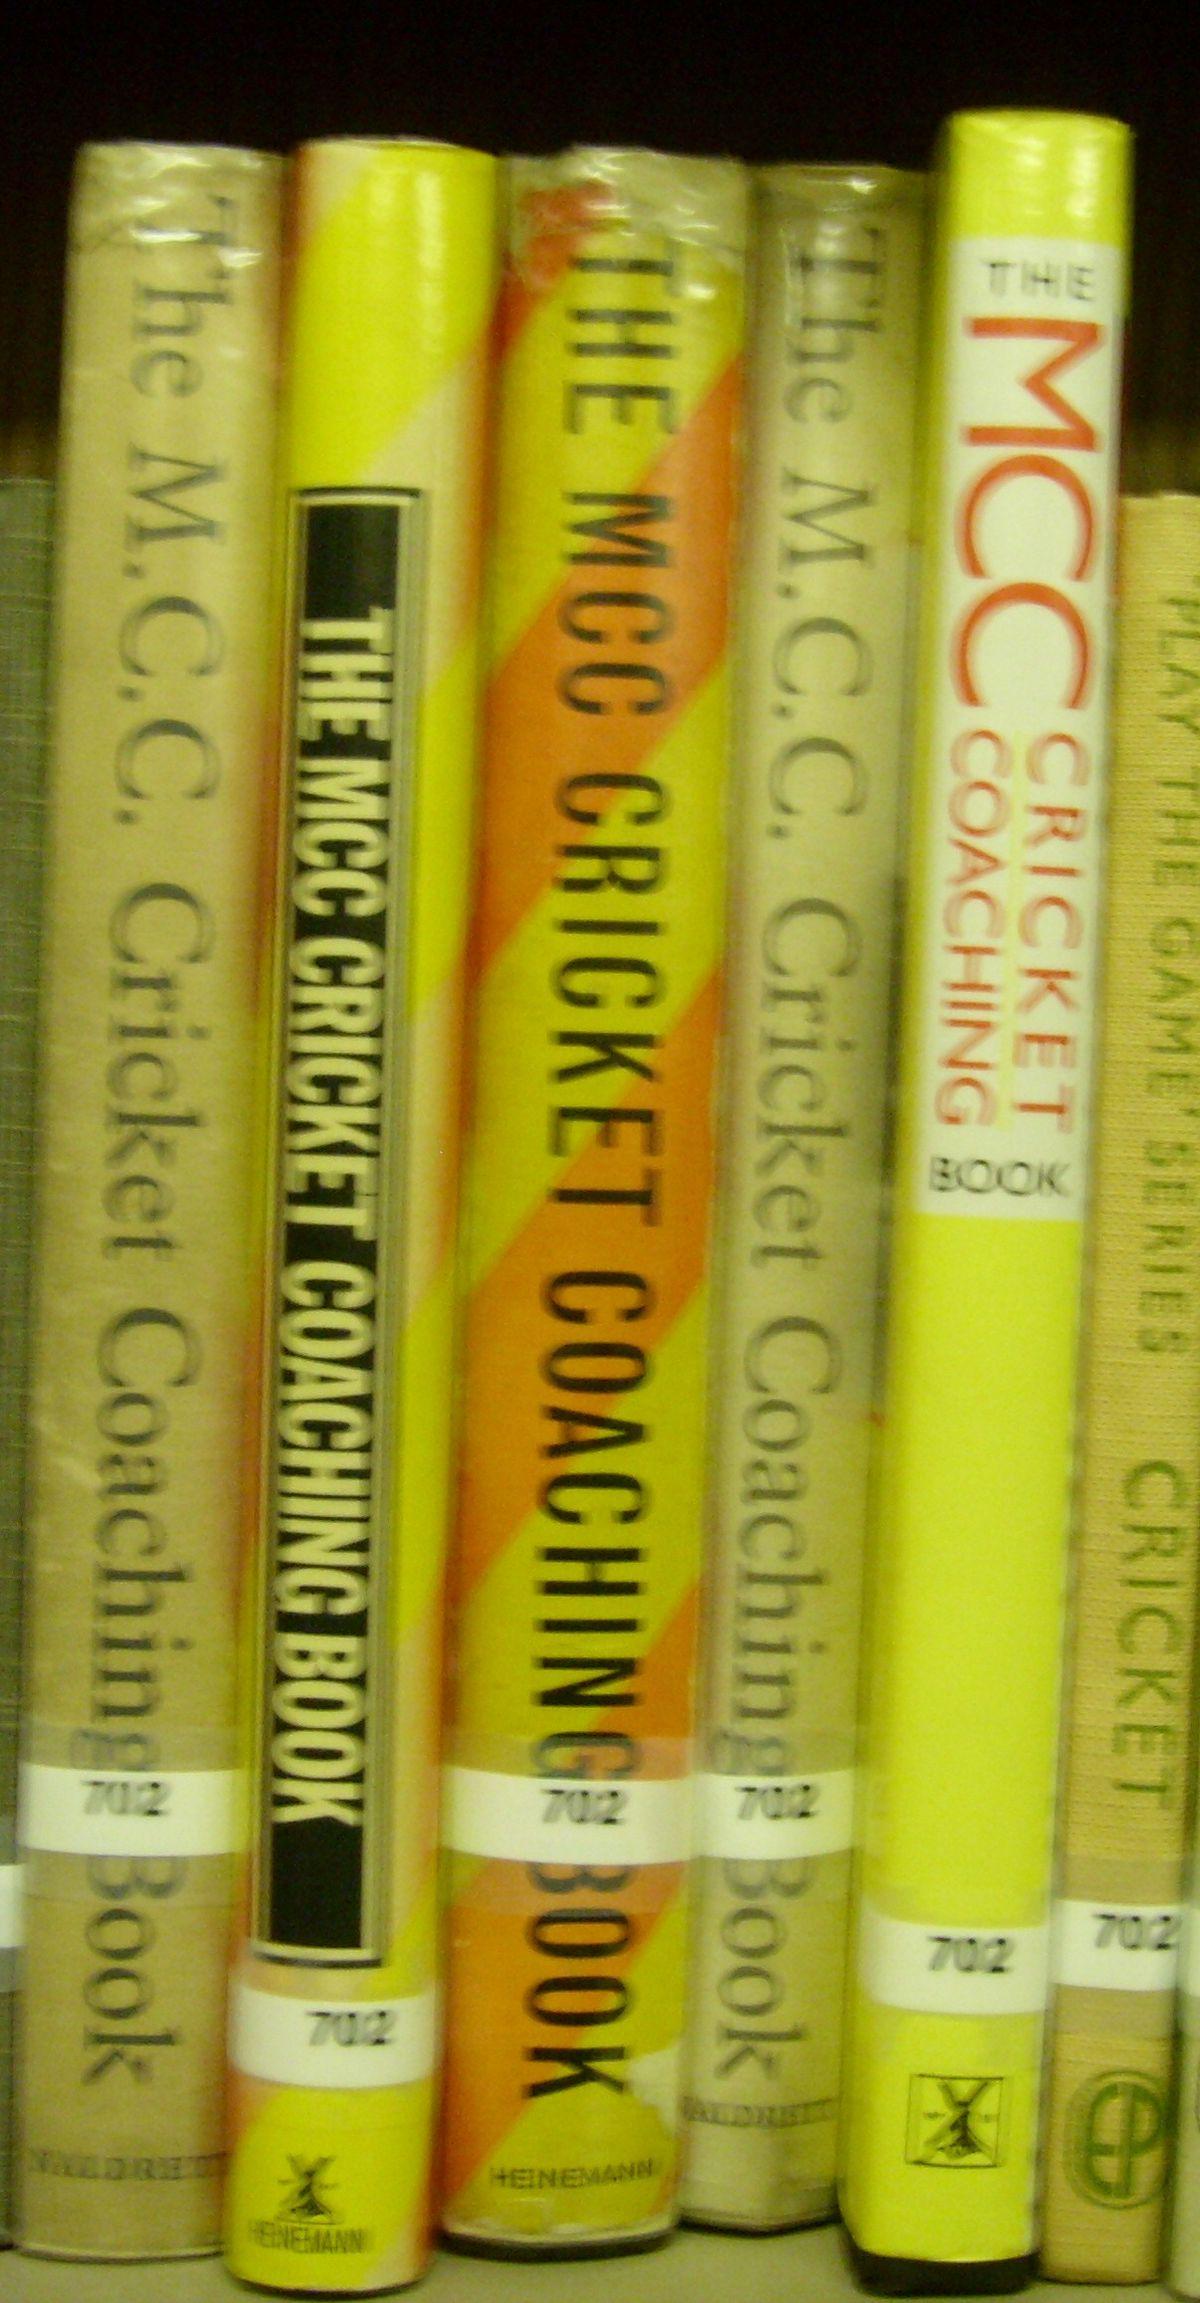 MCC Coaching manual - Wikipedia